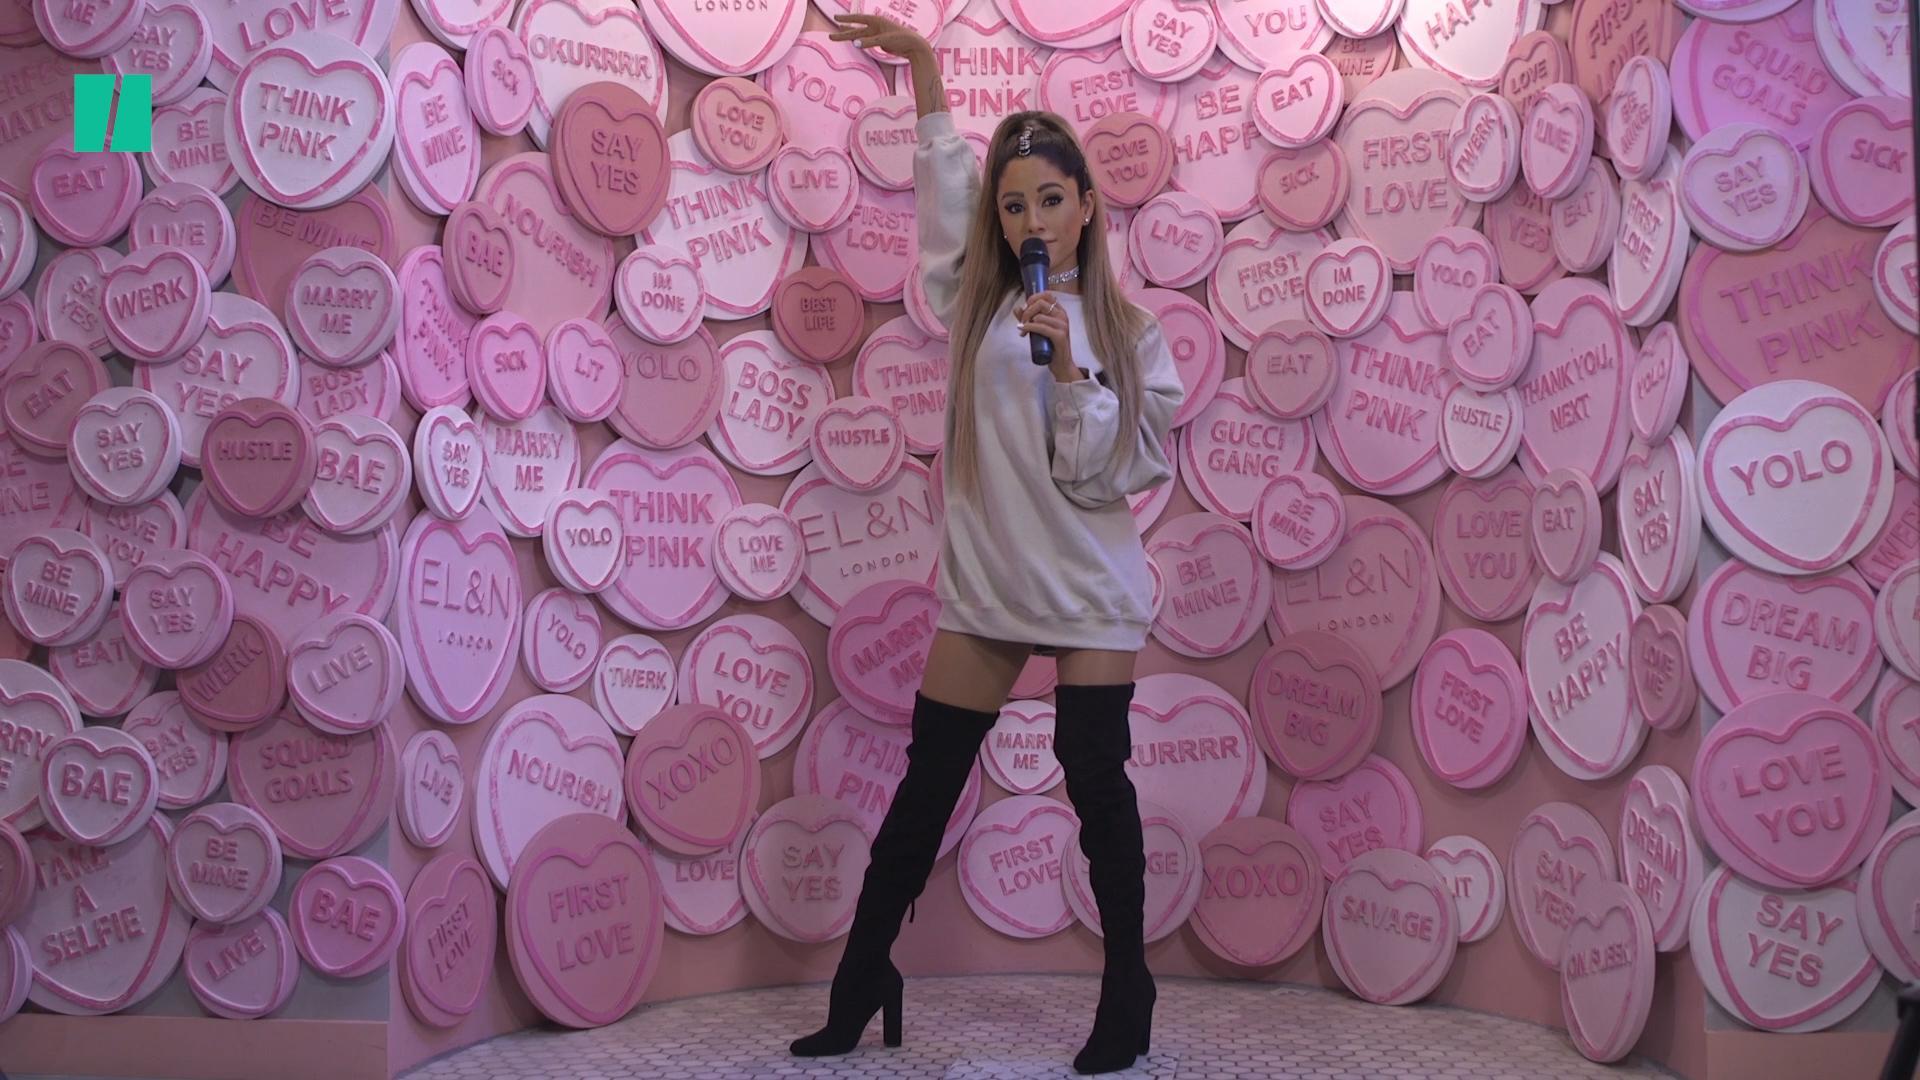 Ariana Grande Waxwork Unveiled